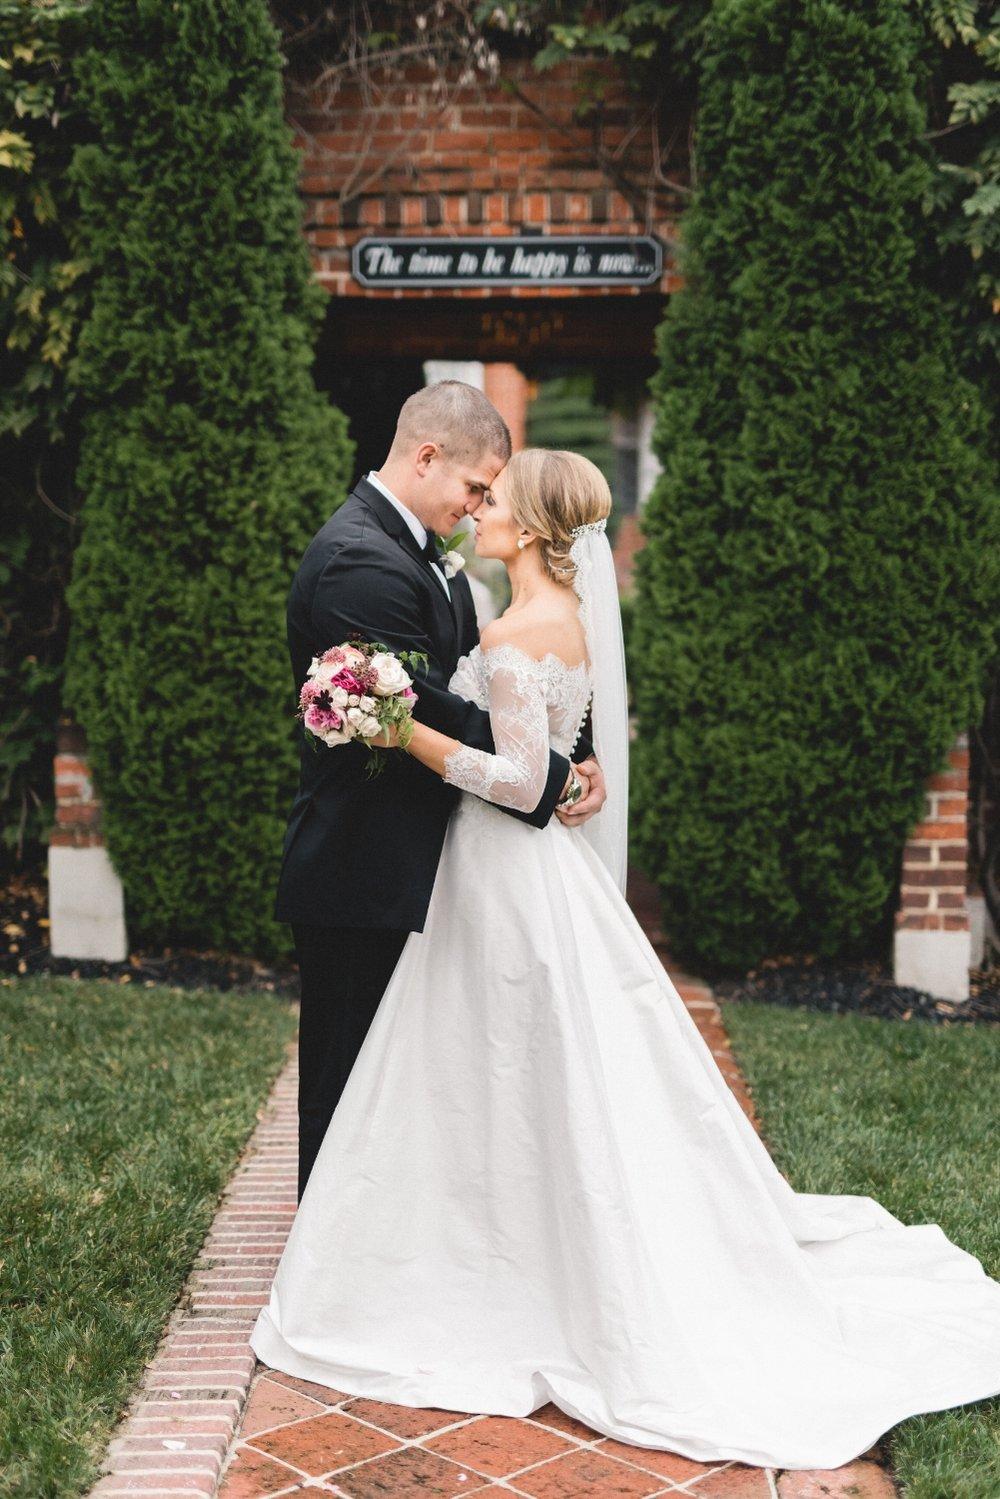 AKC-hunt-maffett-wedding-10-14-17-0654.jpg